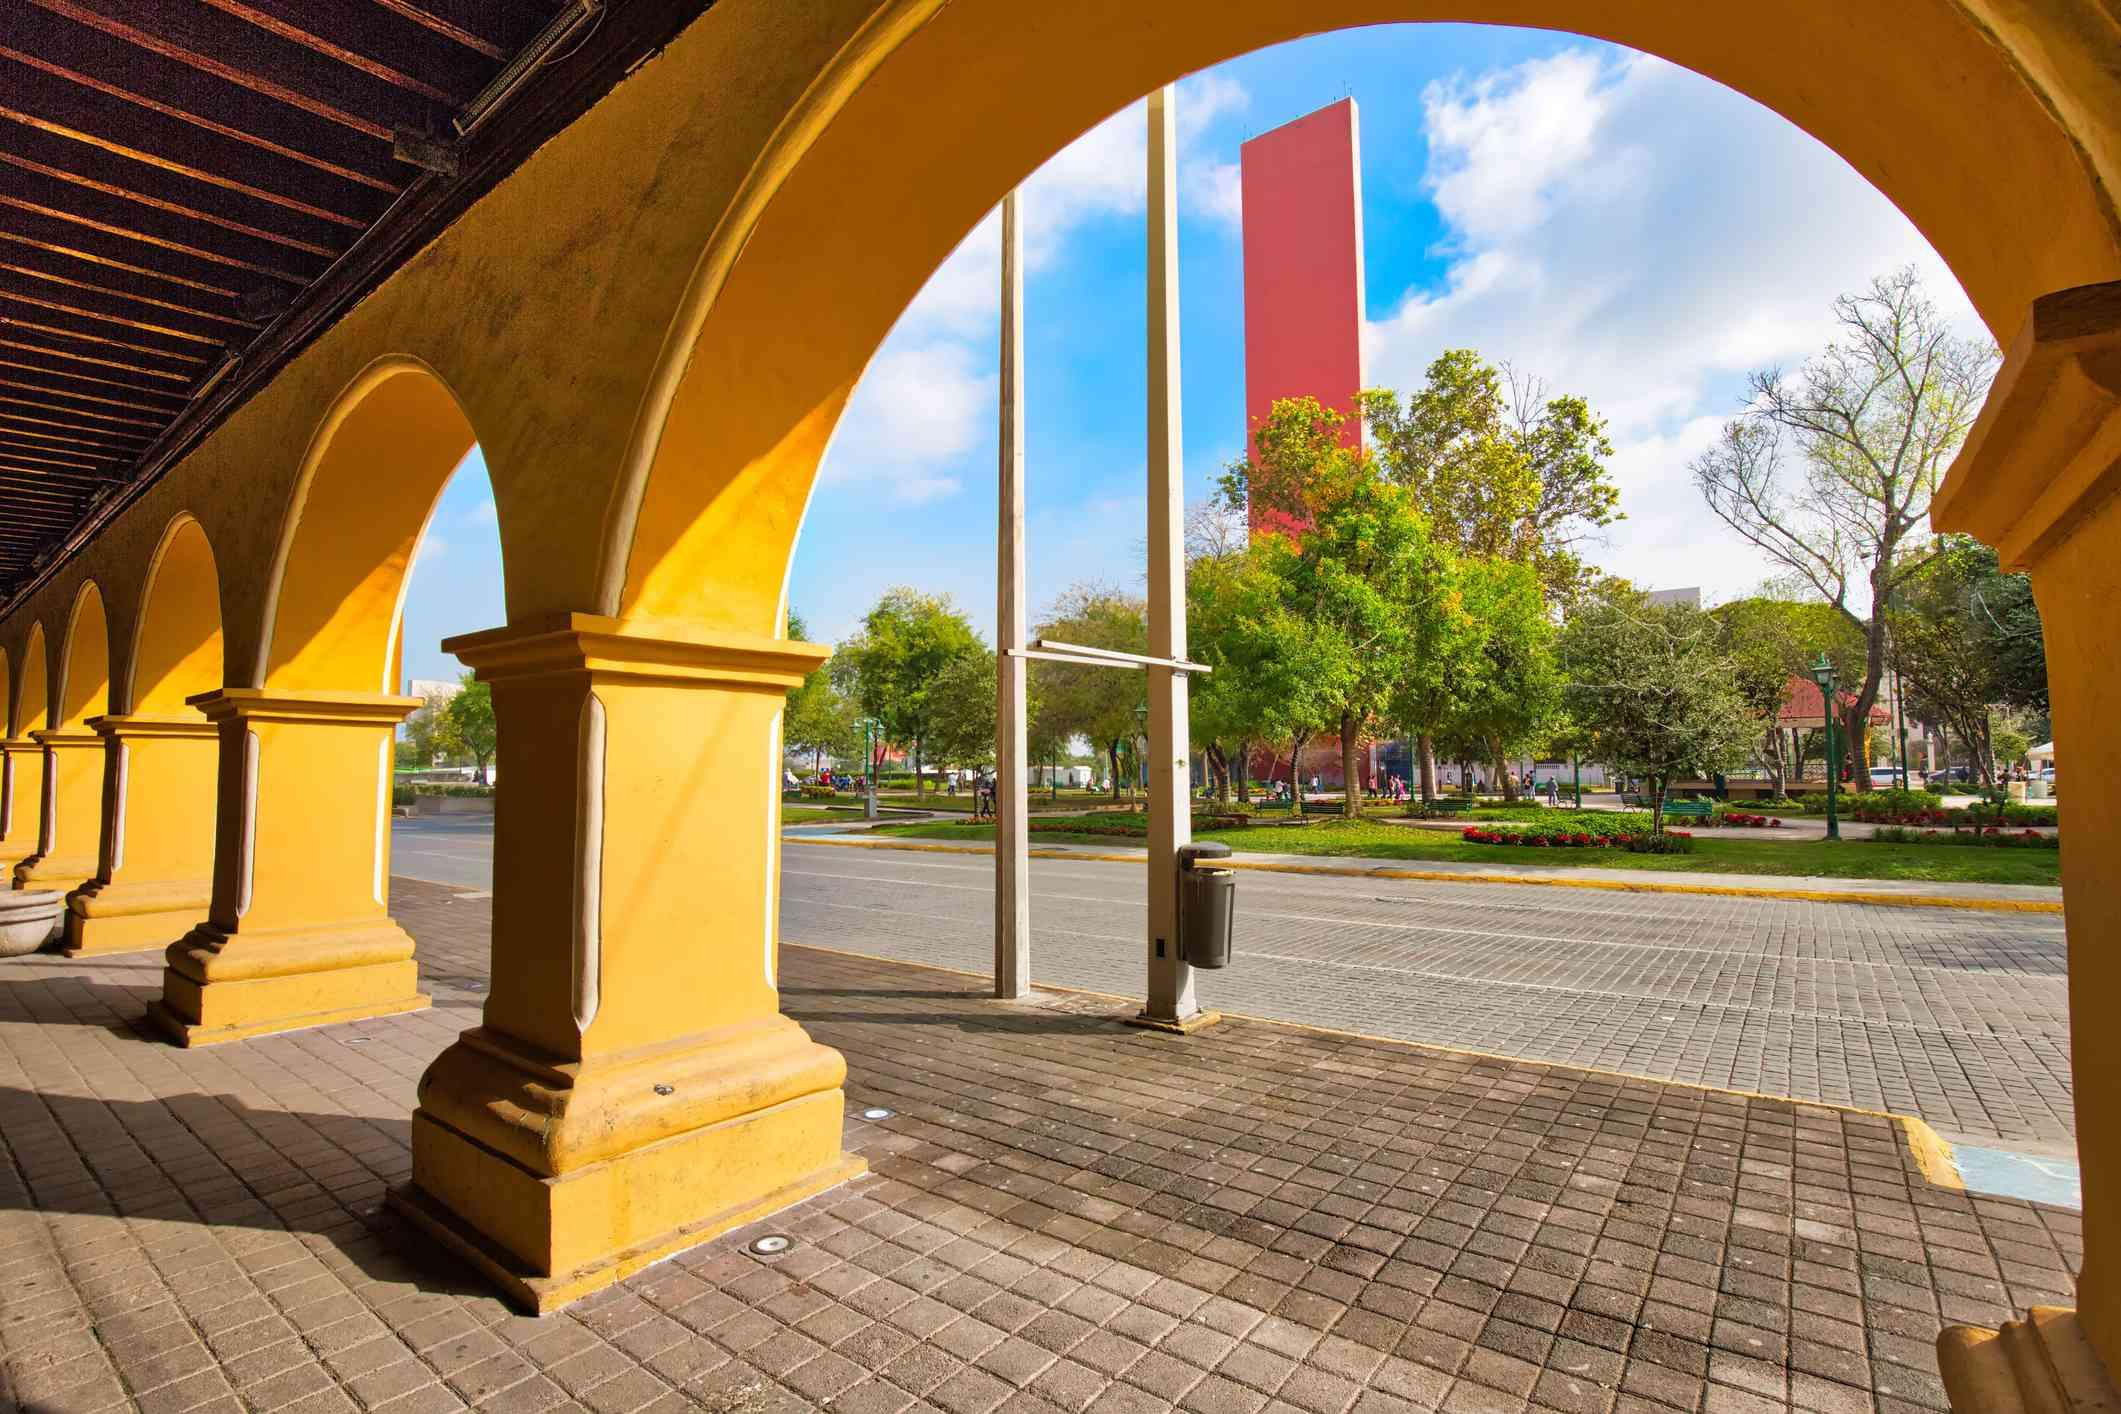 Monterrey, Landmark Macroplaza square in the city historic center